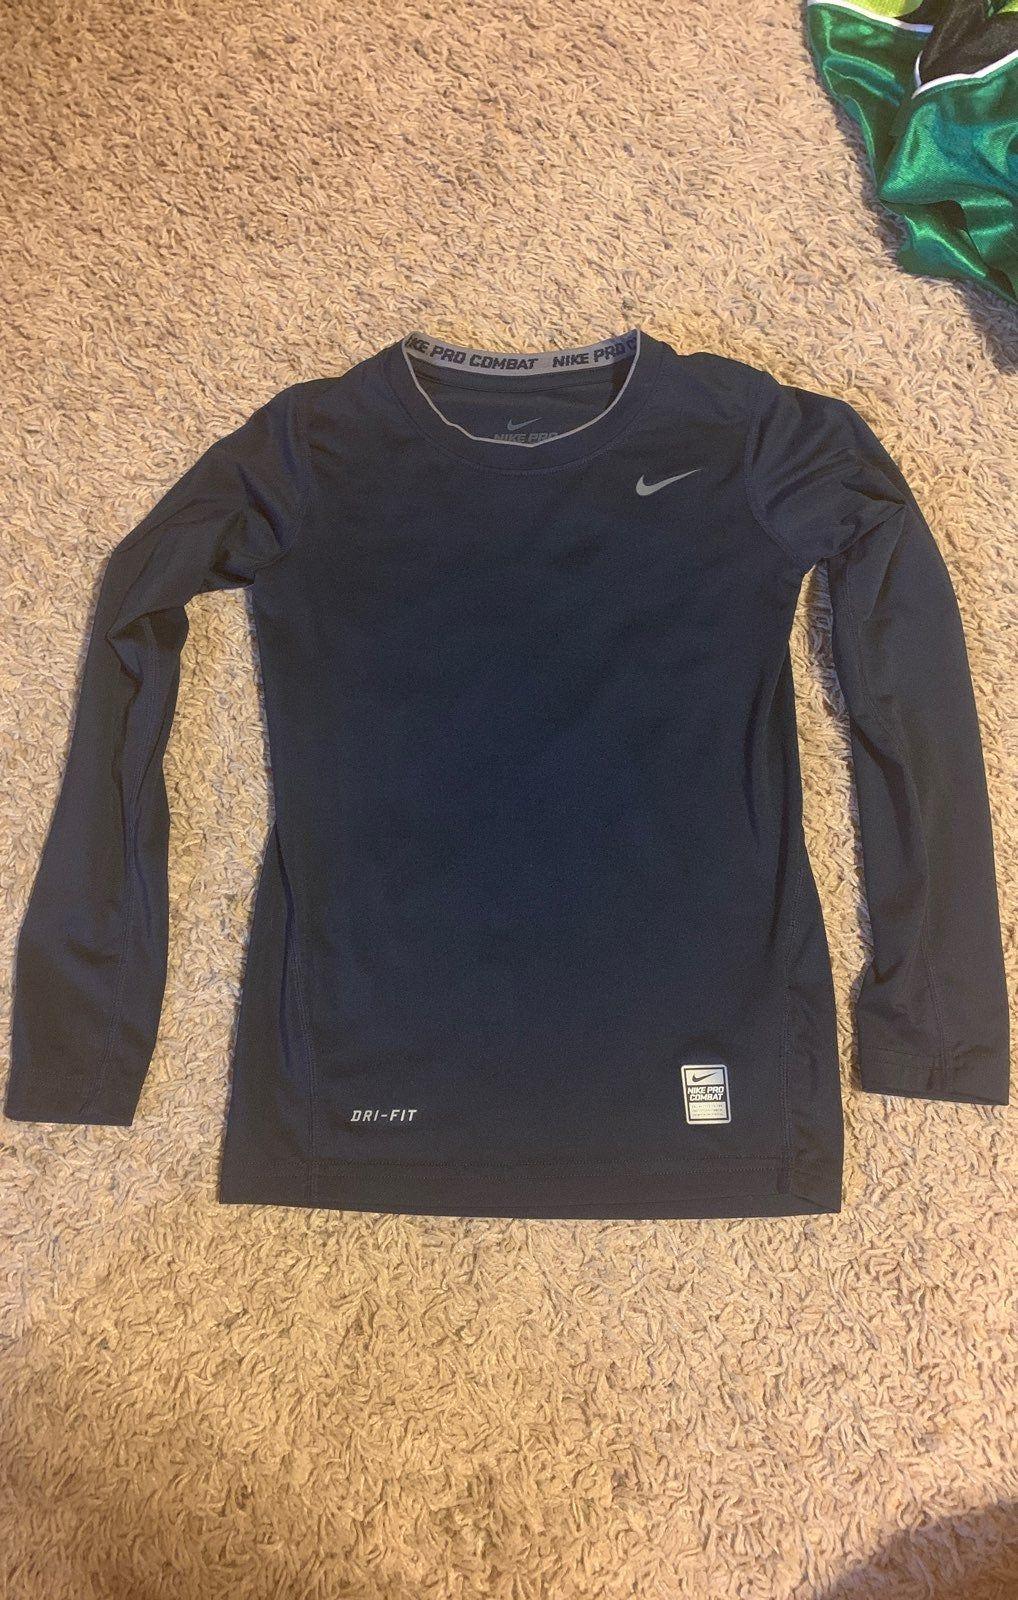 Nike Pro Combat Dri Fit Compression Long Sleeve Shirt Navy Long Sleeve Tshirt Men Long Sleeve Shirts Nike Tops [ 1600 x 1018 Pixel ]